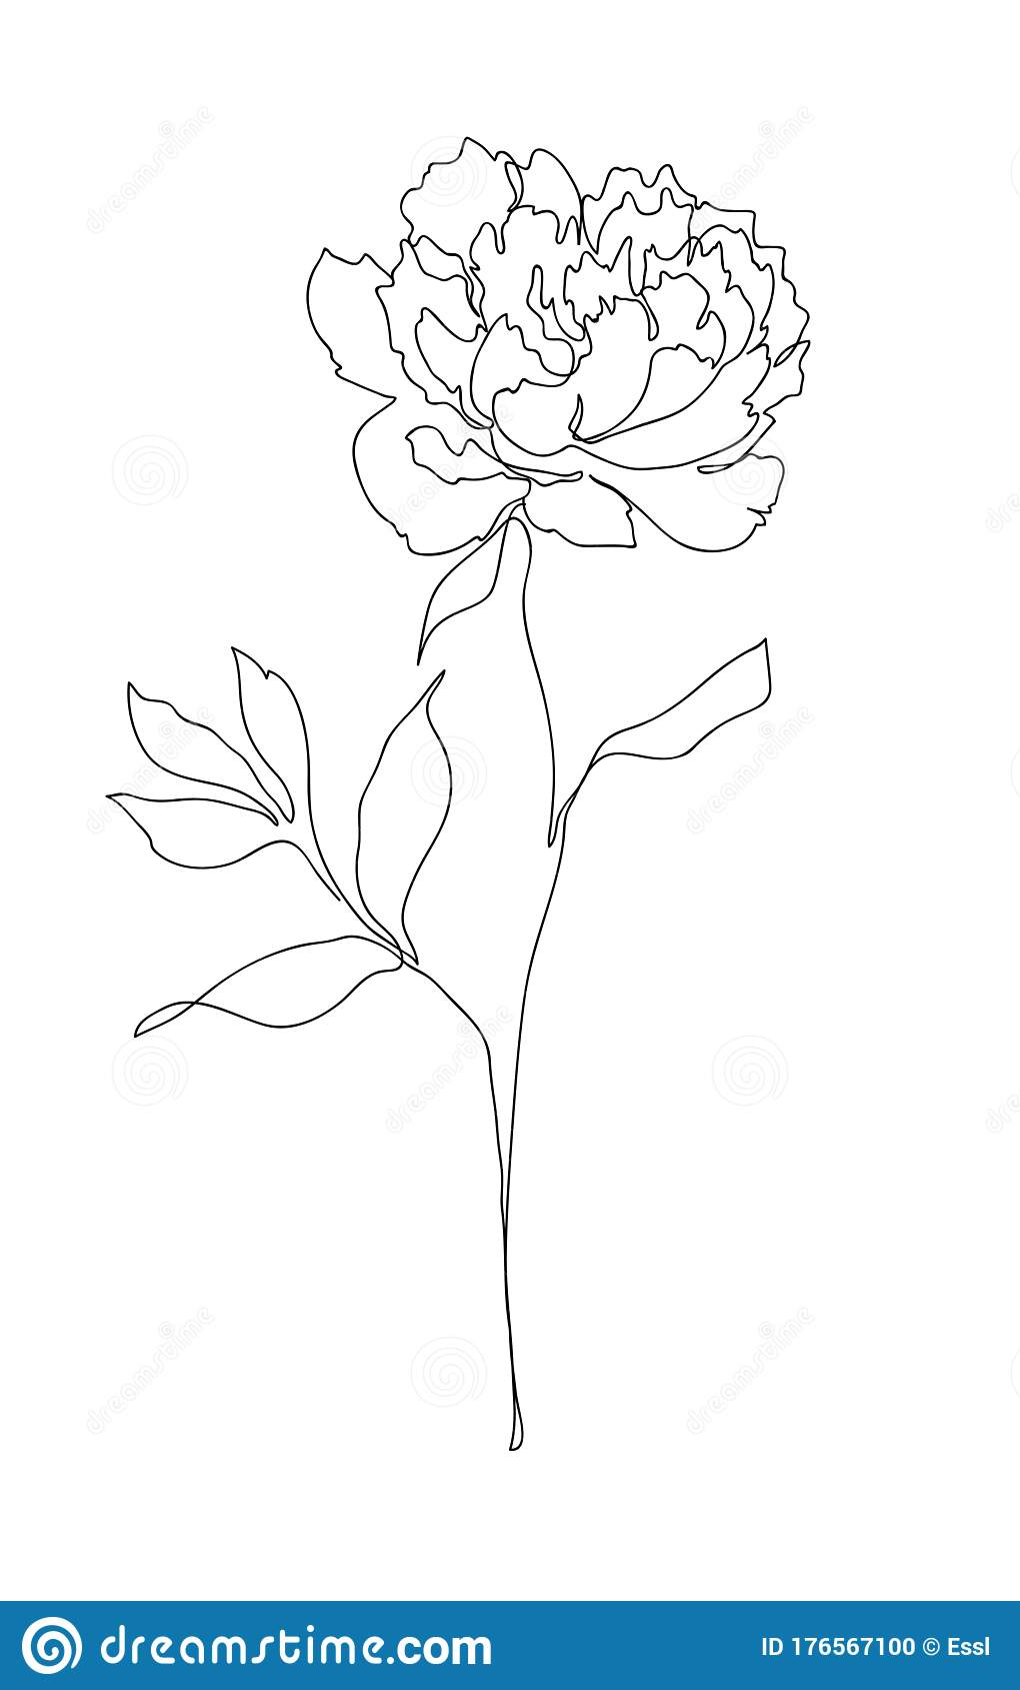 Beautiful Peony Flower Line Art Stock Vector Illustration Of Drawing Line 176567100